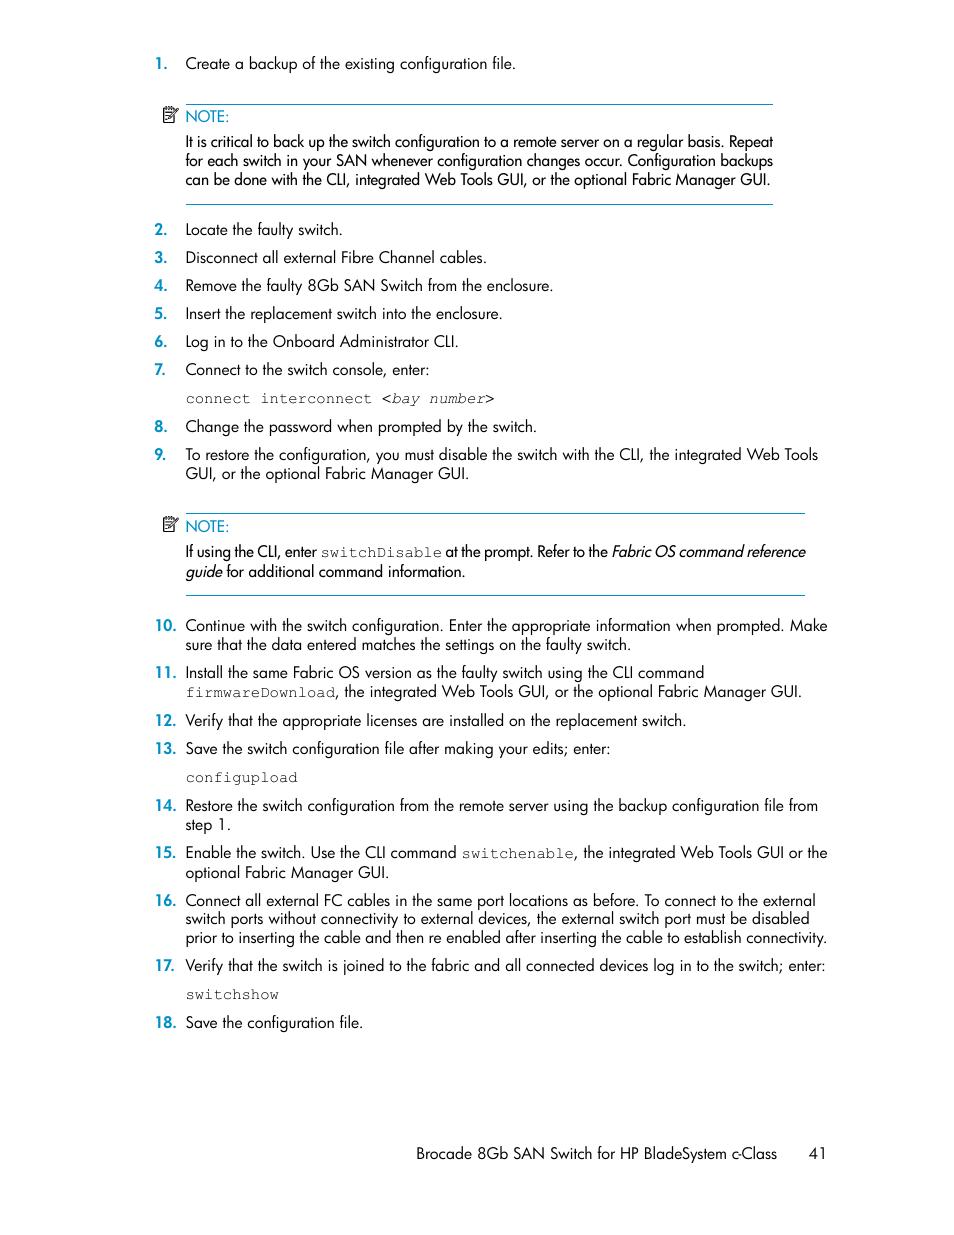 HP Brocade 8Gb SAN Switch for HP BladeSystem c-Class User Manual